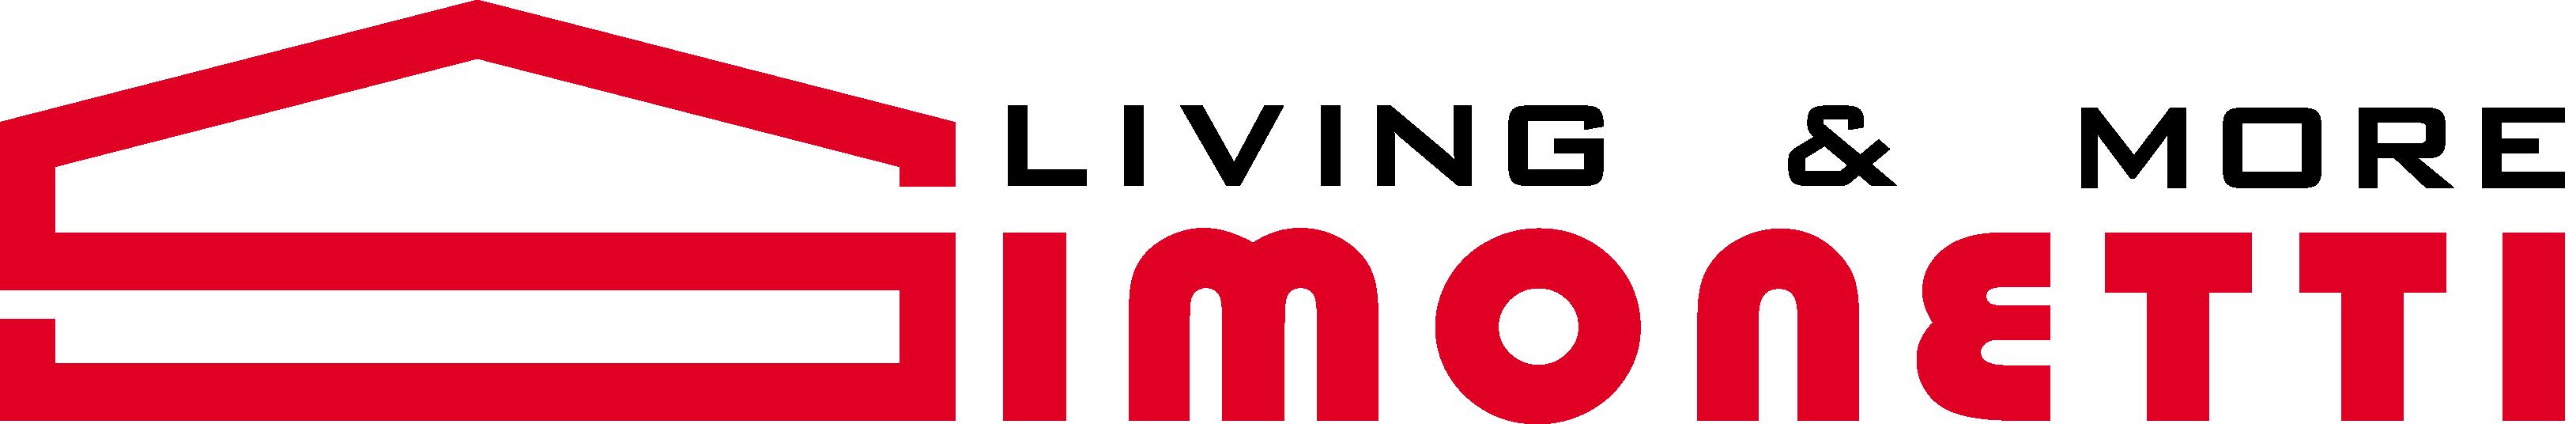 Fratelli Simonetti Spa Ancarano (TE) logo